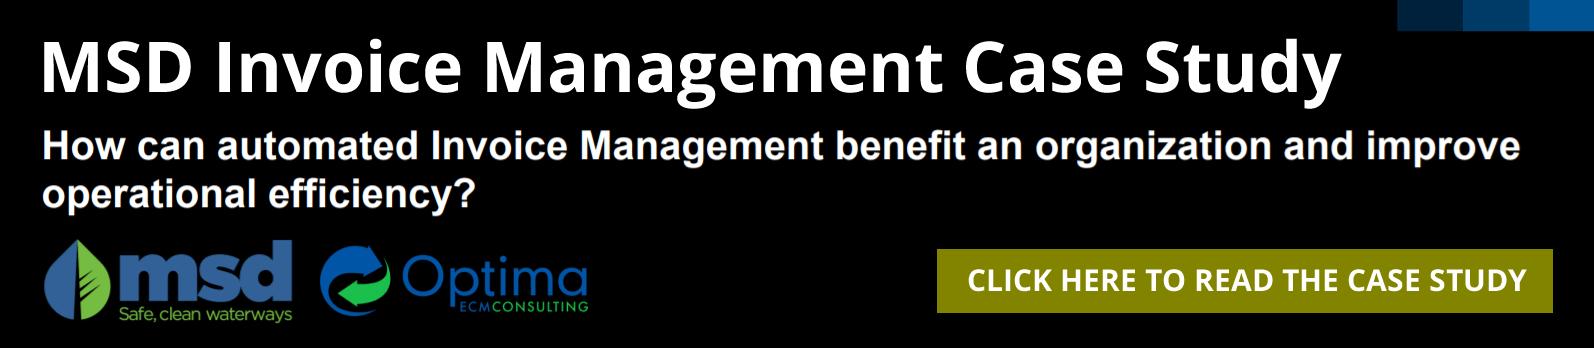 accounts-payable-invoice-management-case-study